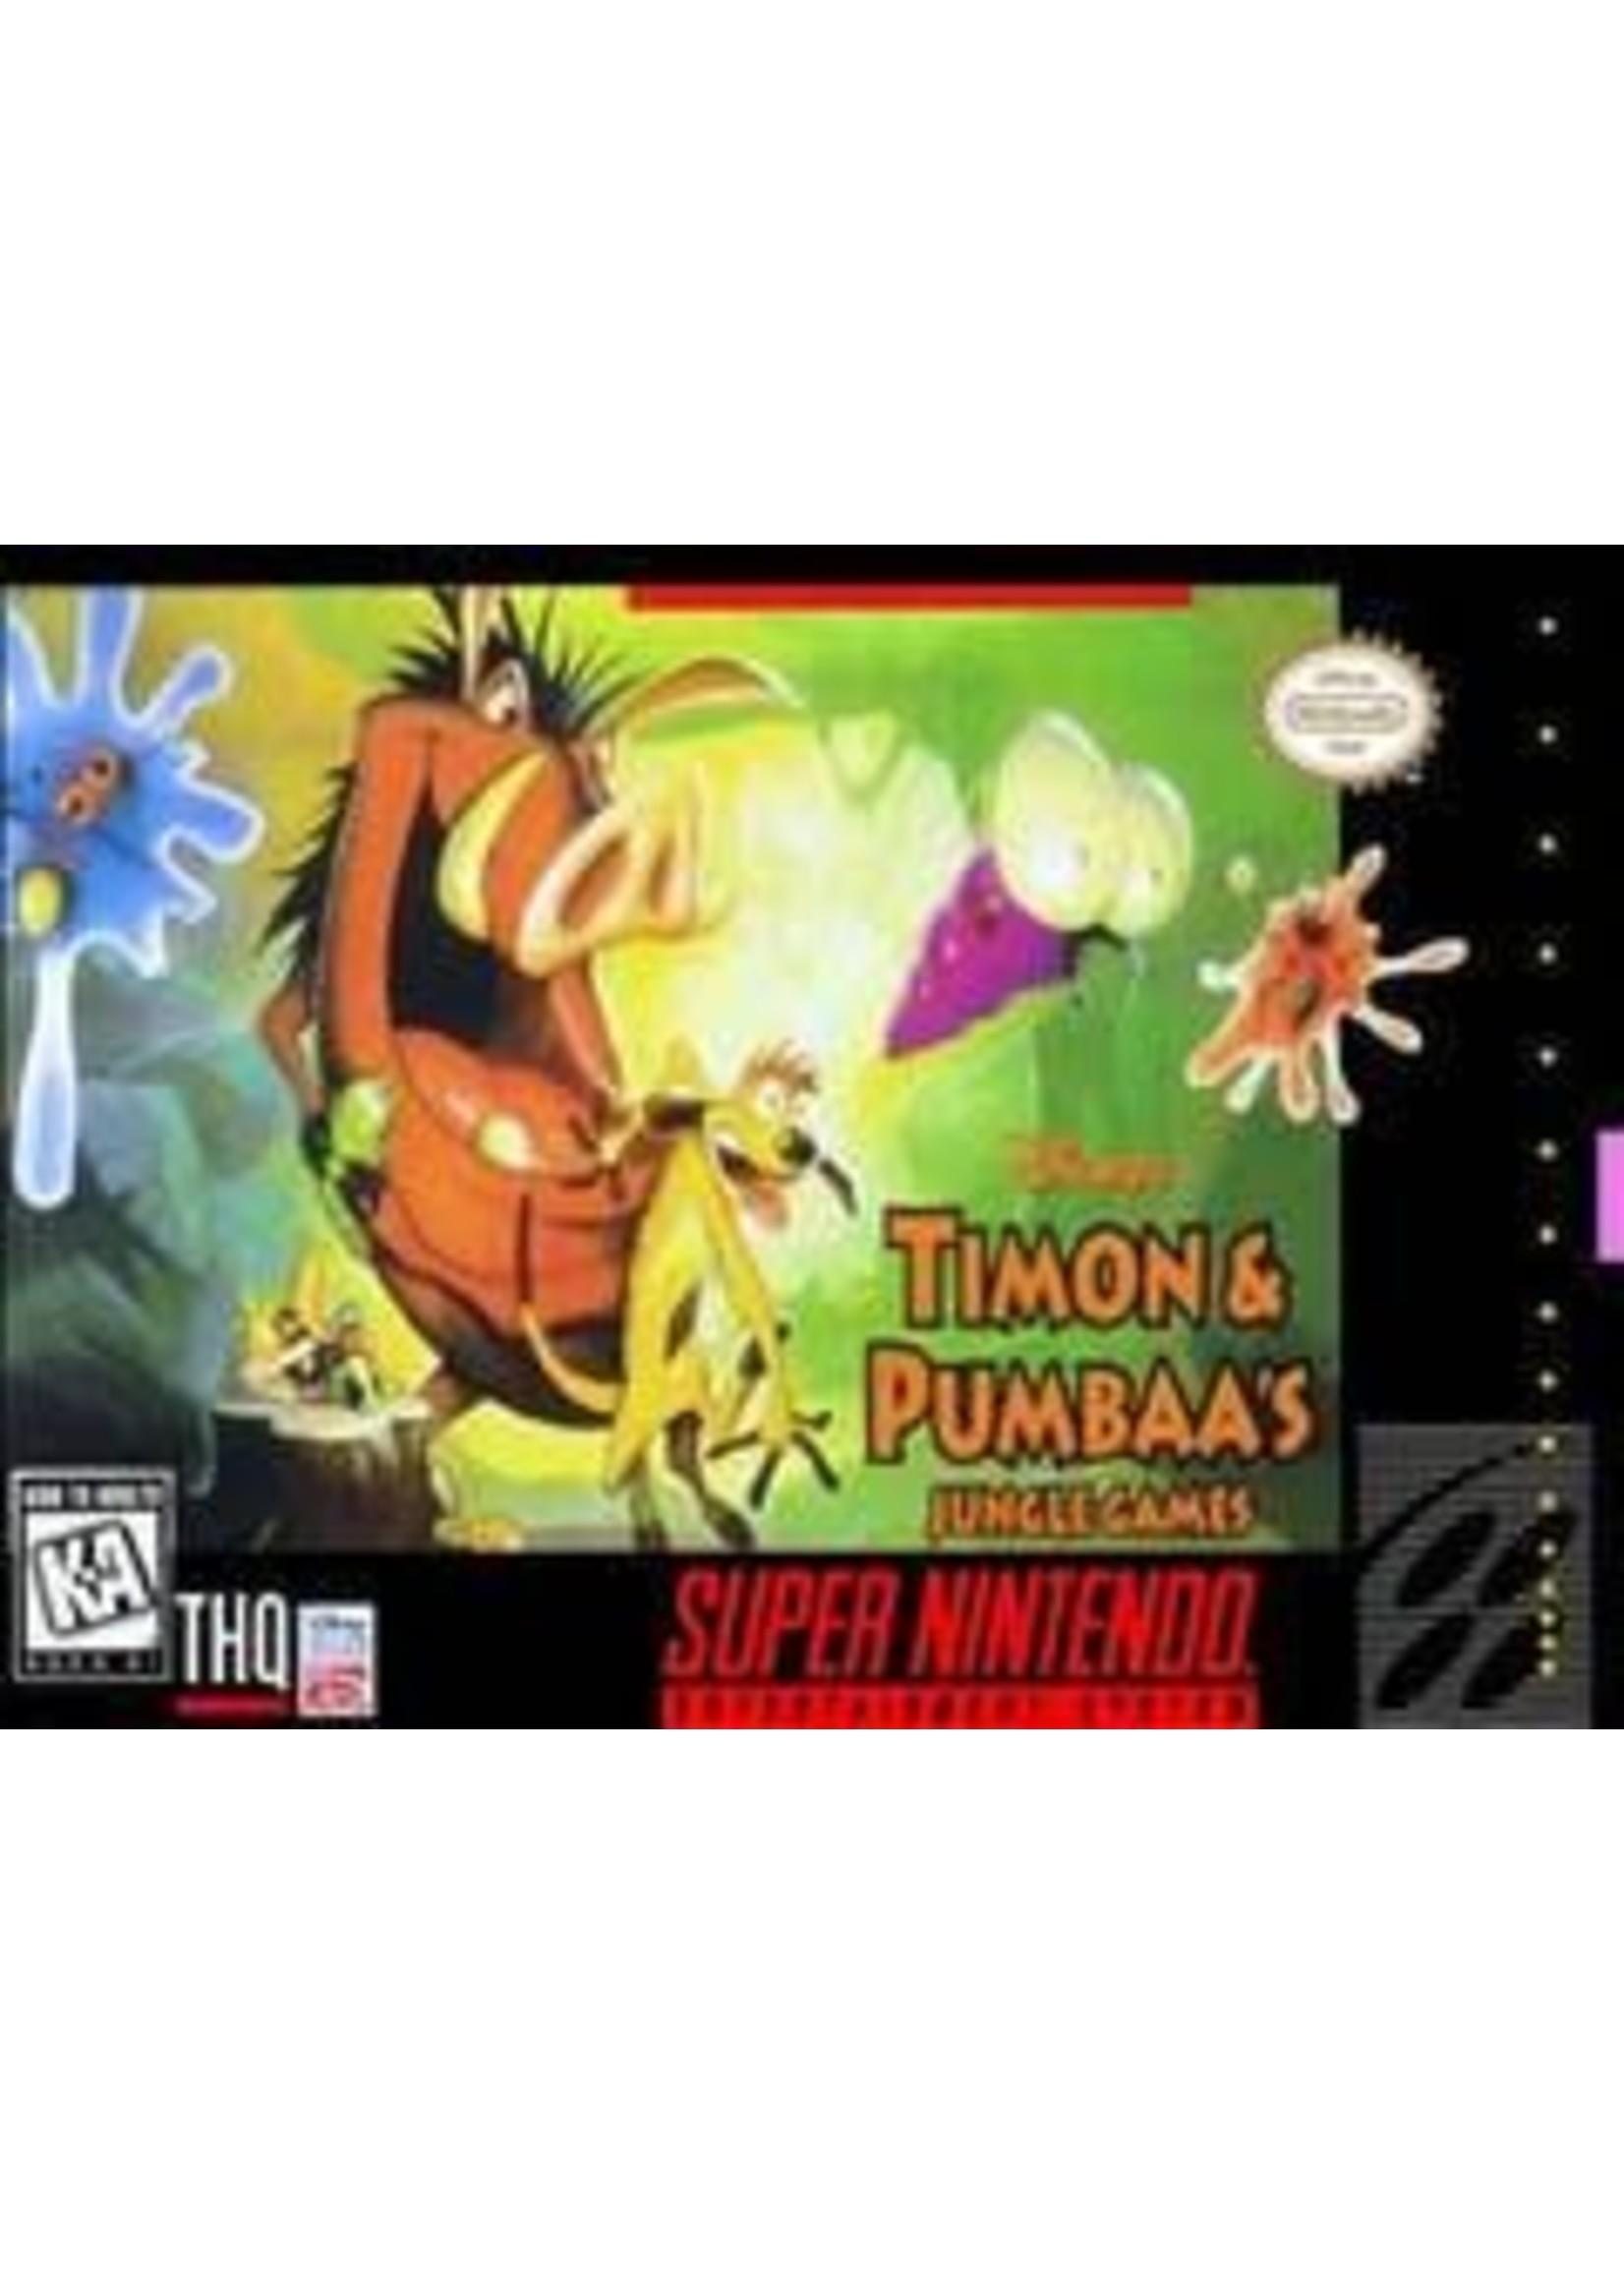 disney timon & pumbaa's jungle games